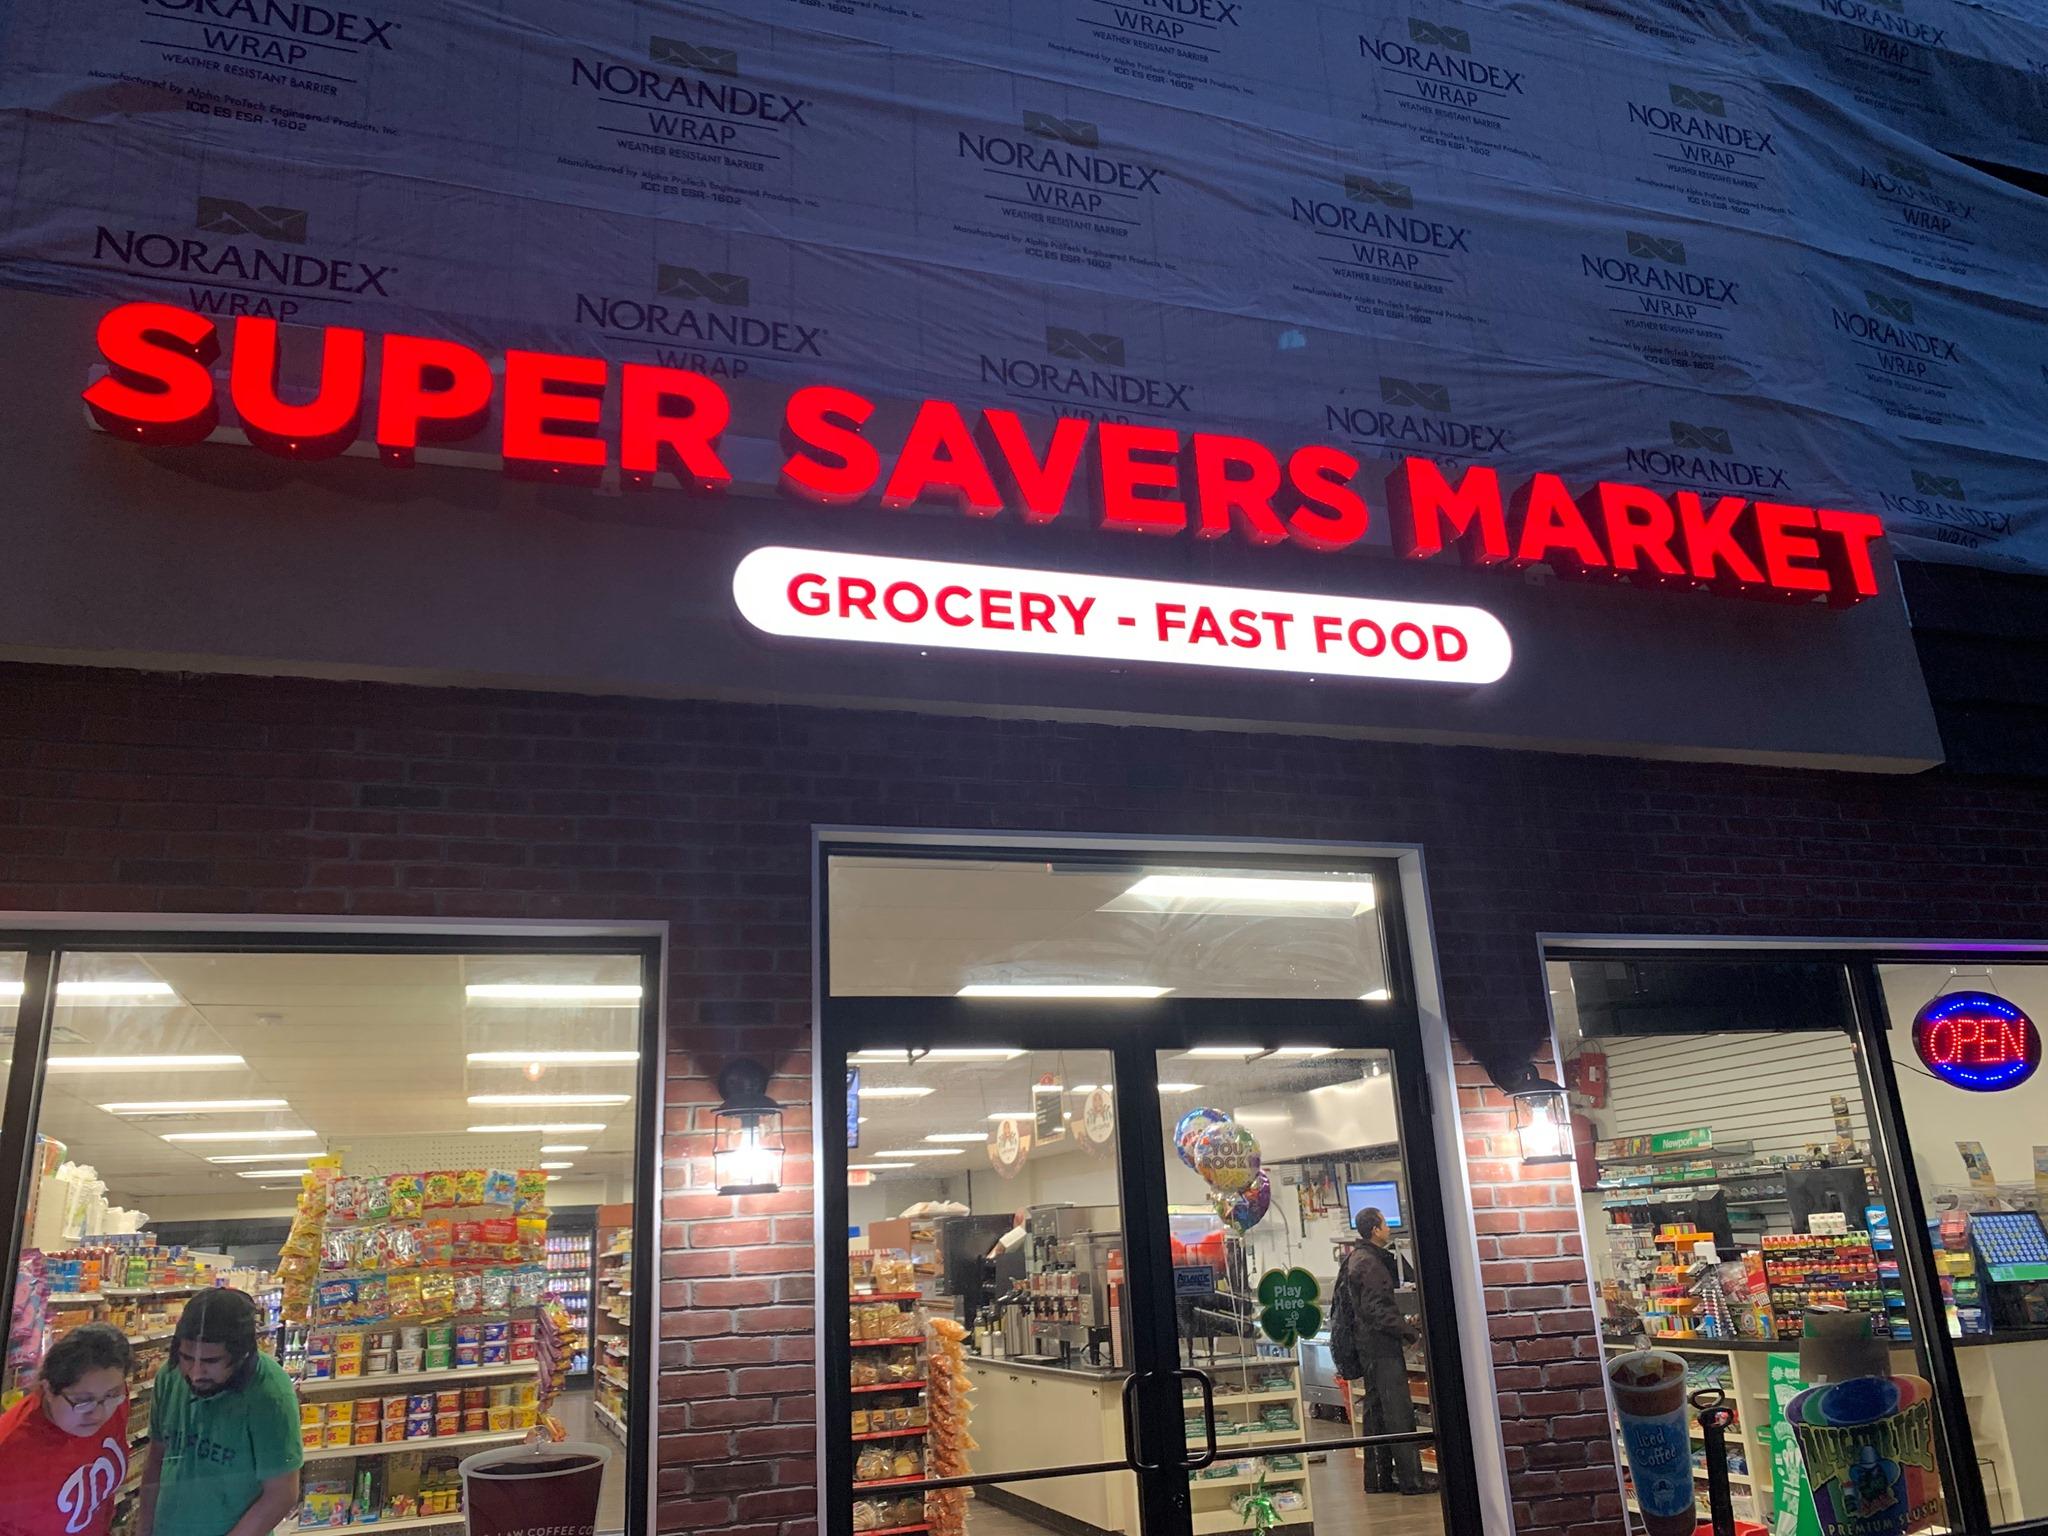 Supersaver Market